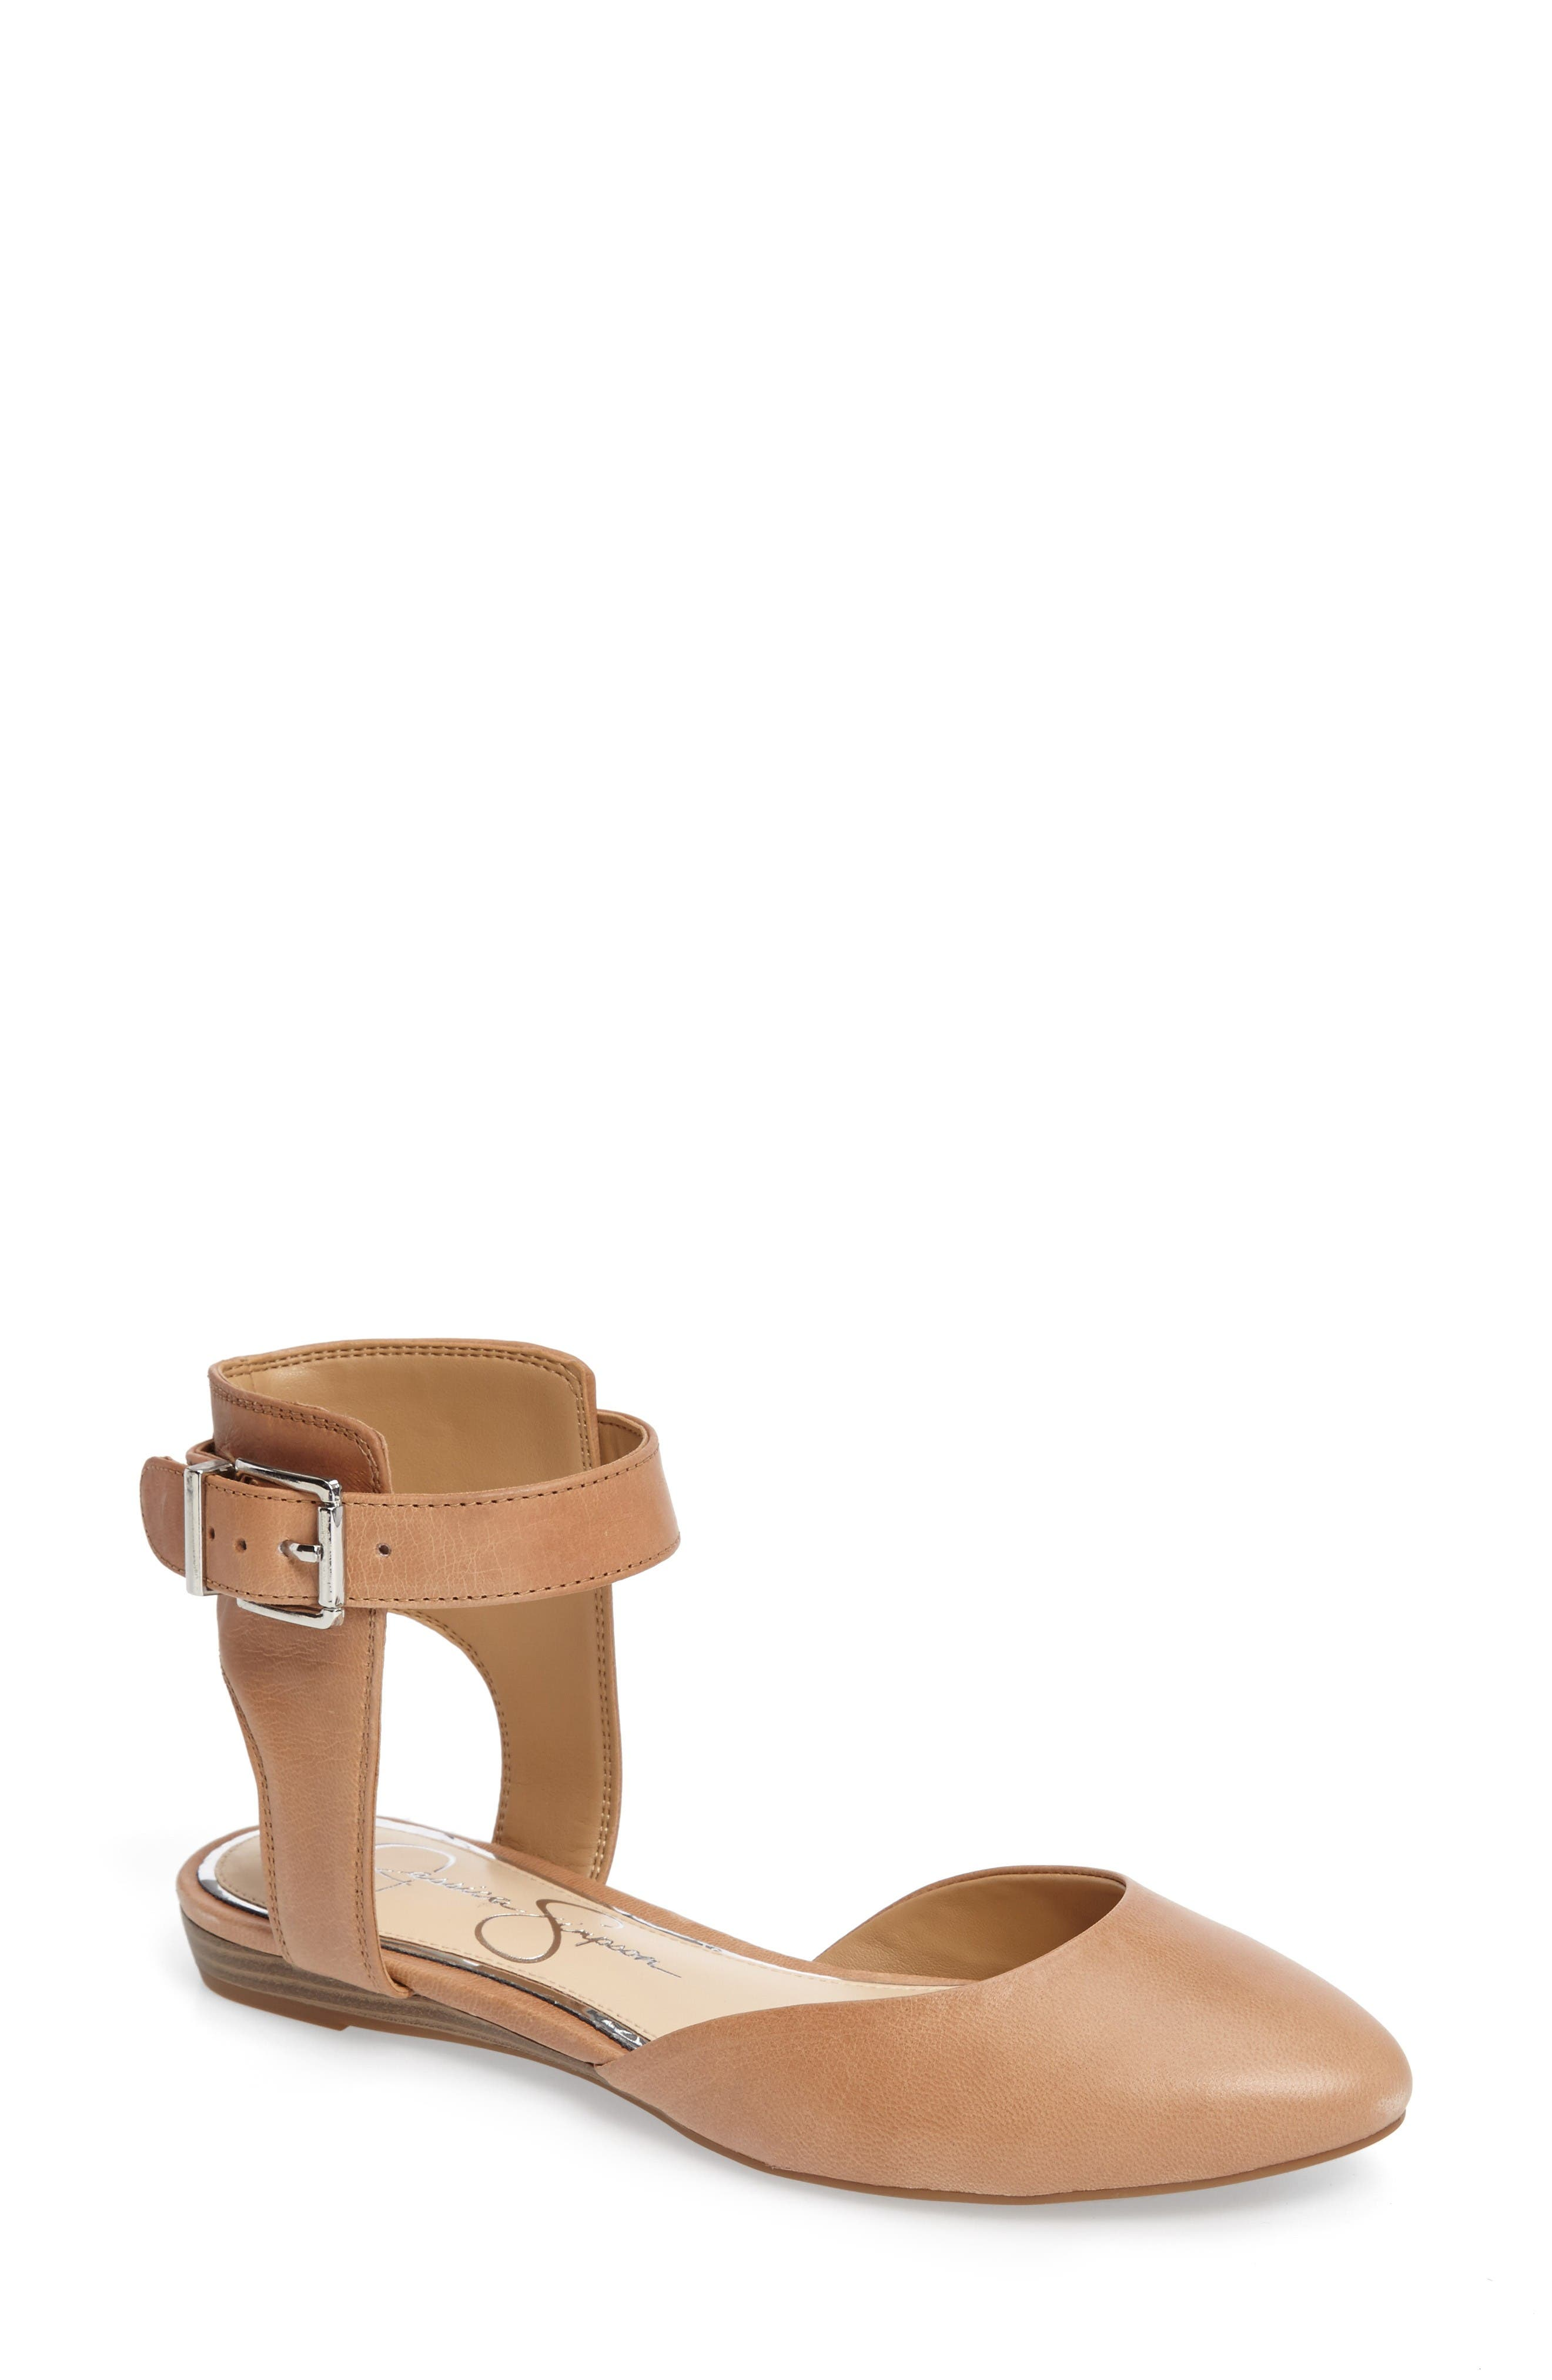 Loranda Ankle Strap Flat,                         Main,                         color, Buff